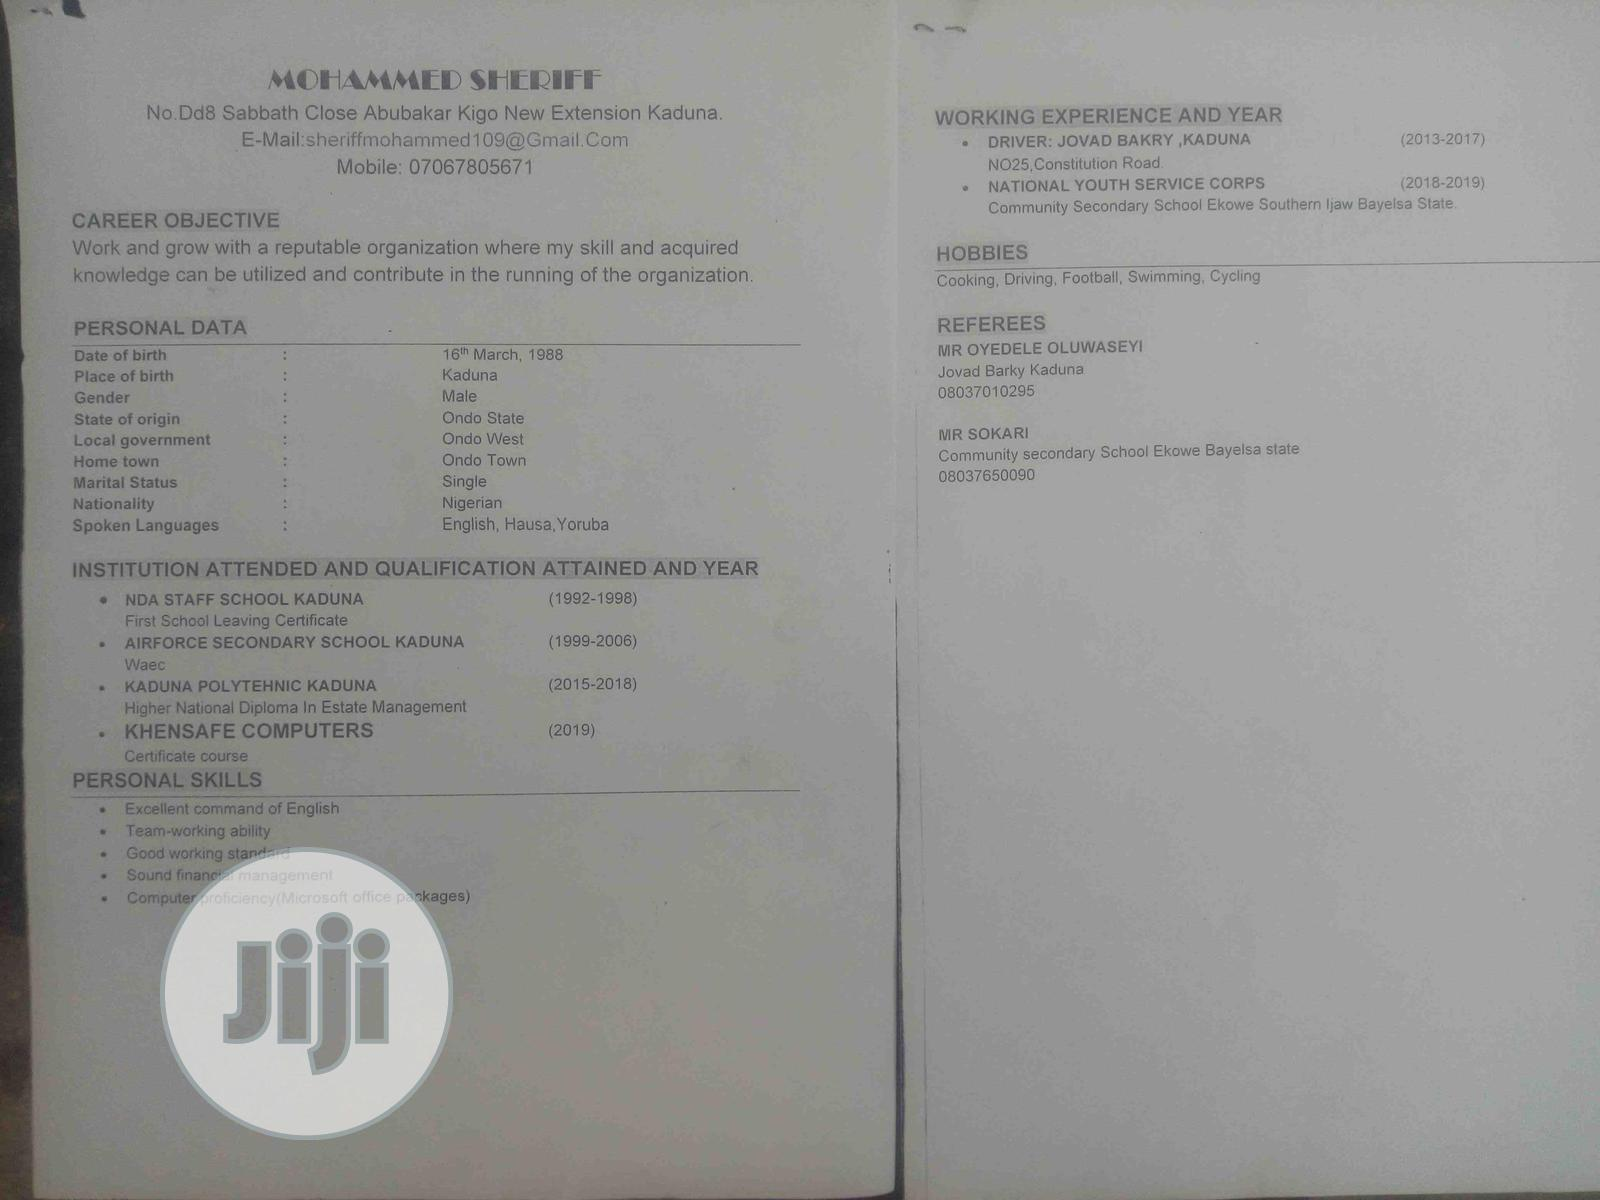 Customer Service CV